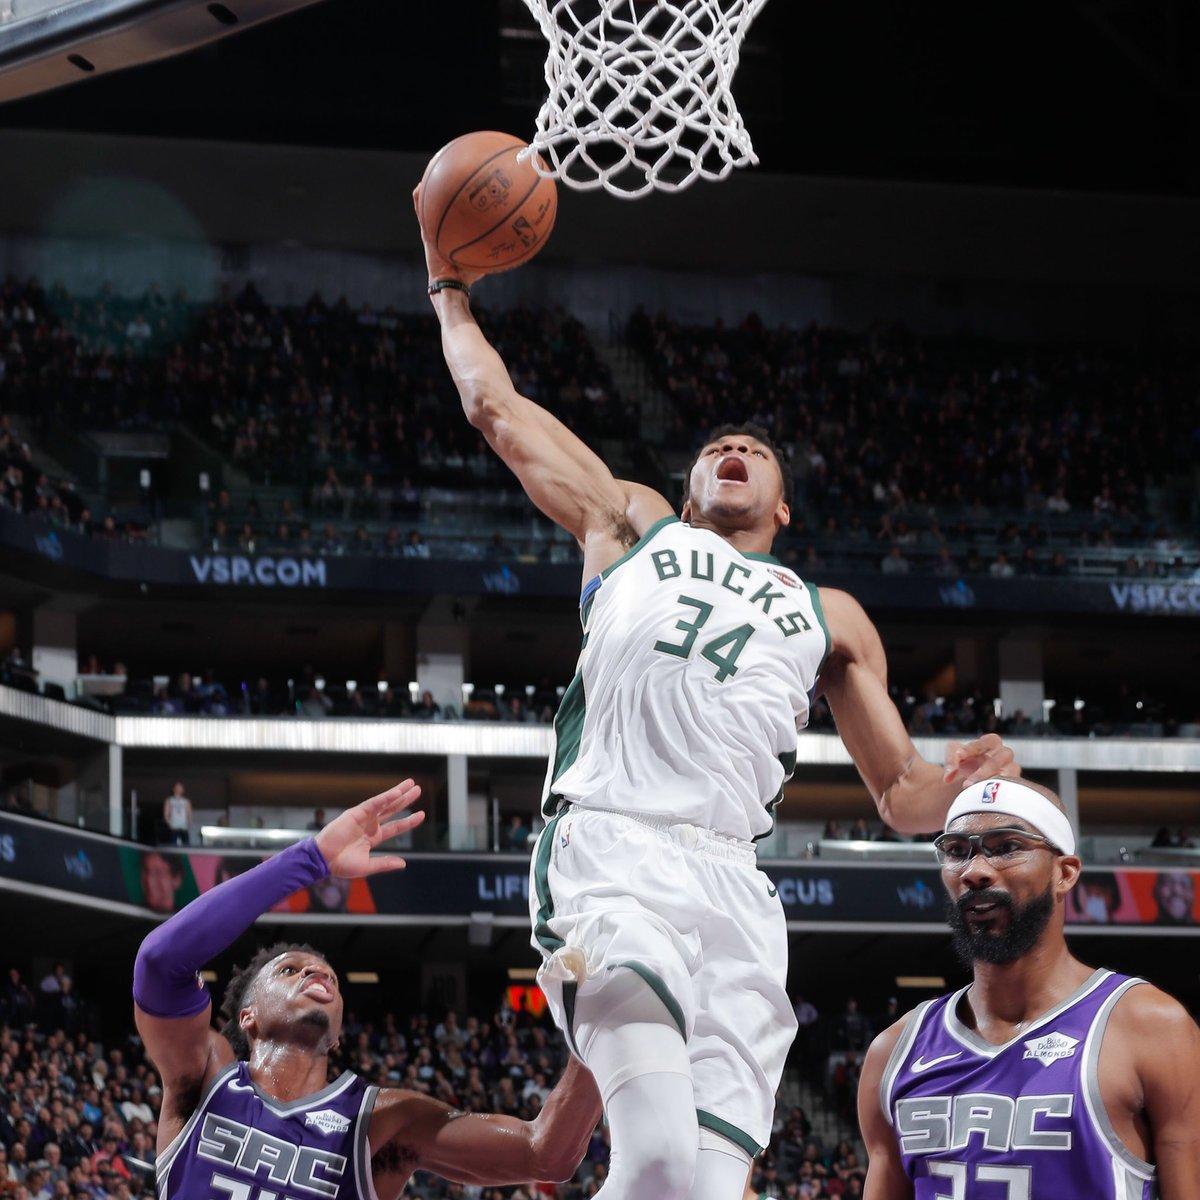 Warriors Vs Nets Full Game Highlights: Show Recap: February 28, 2019 (Amin Elhassan Hosts)